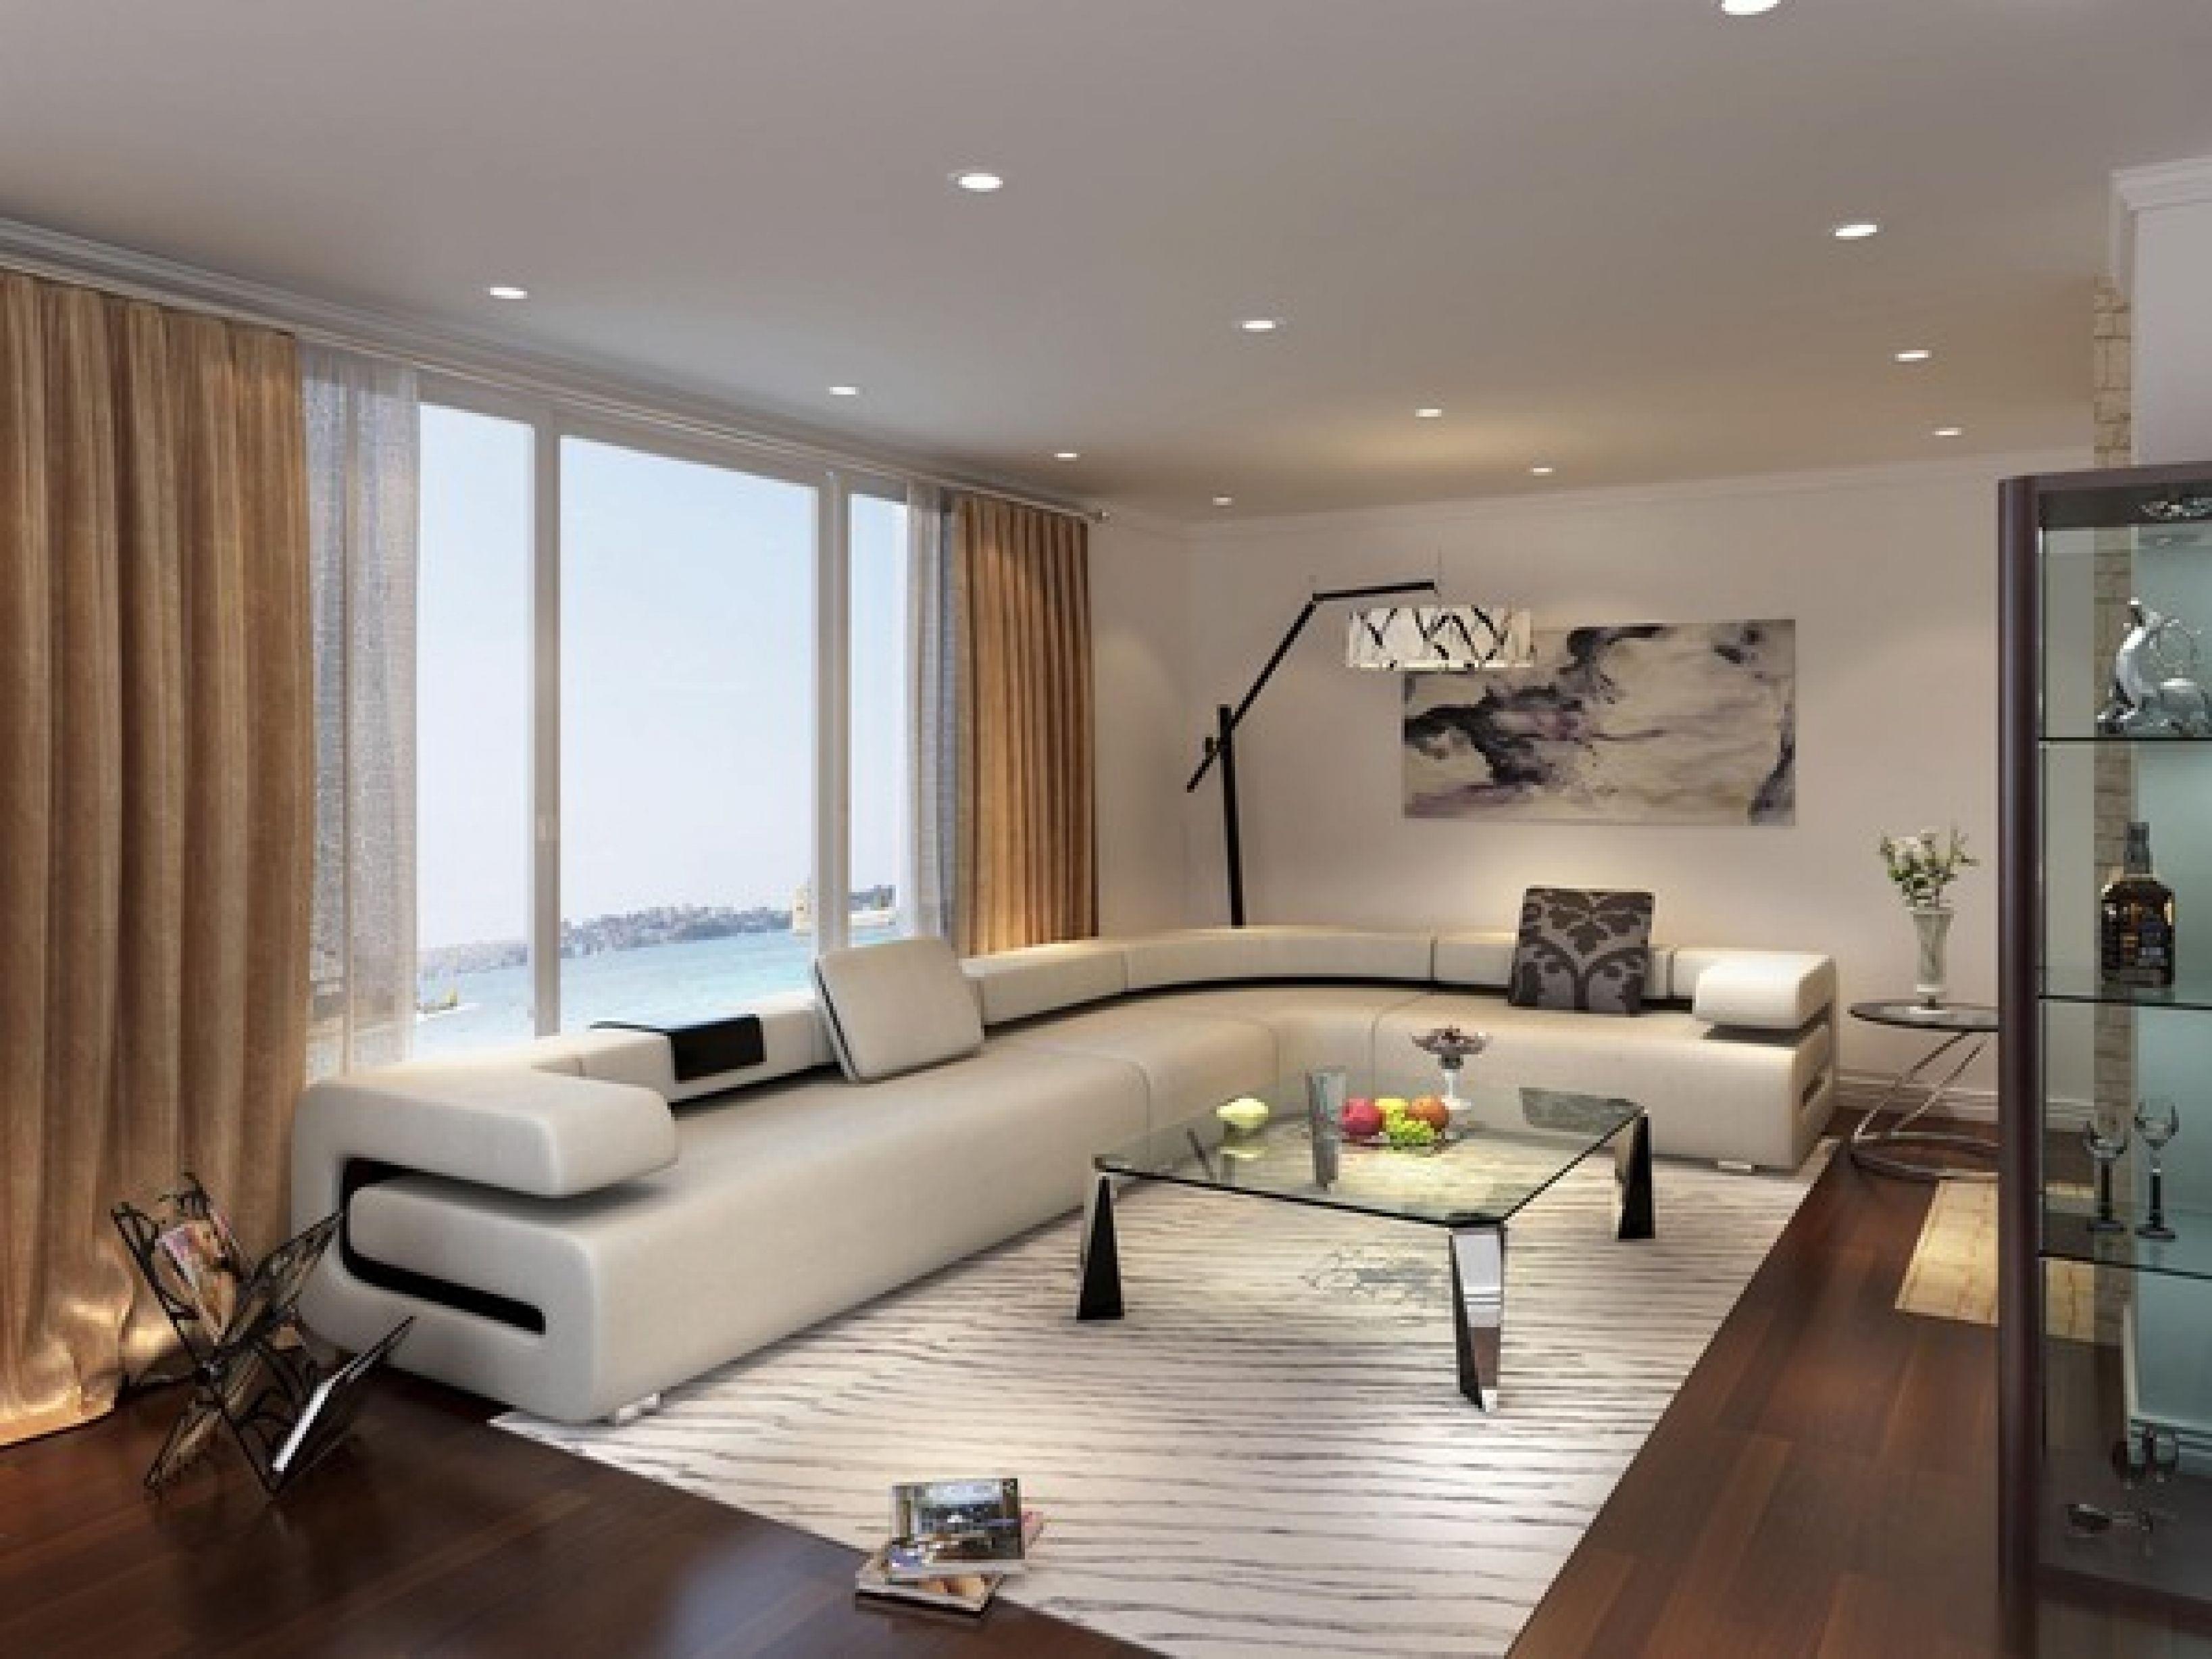 2 Interior Interior Design Living Room Bungalow Interiors Living Room Decor Modern